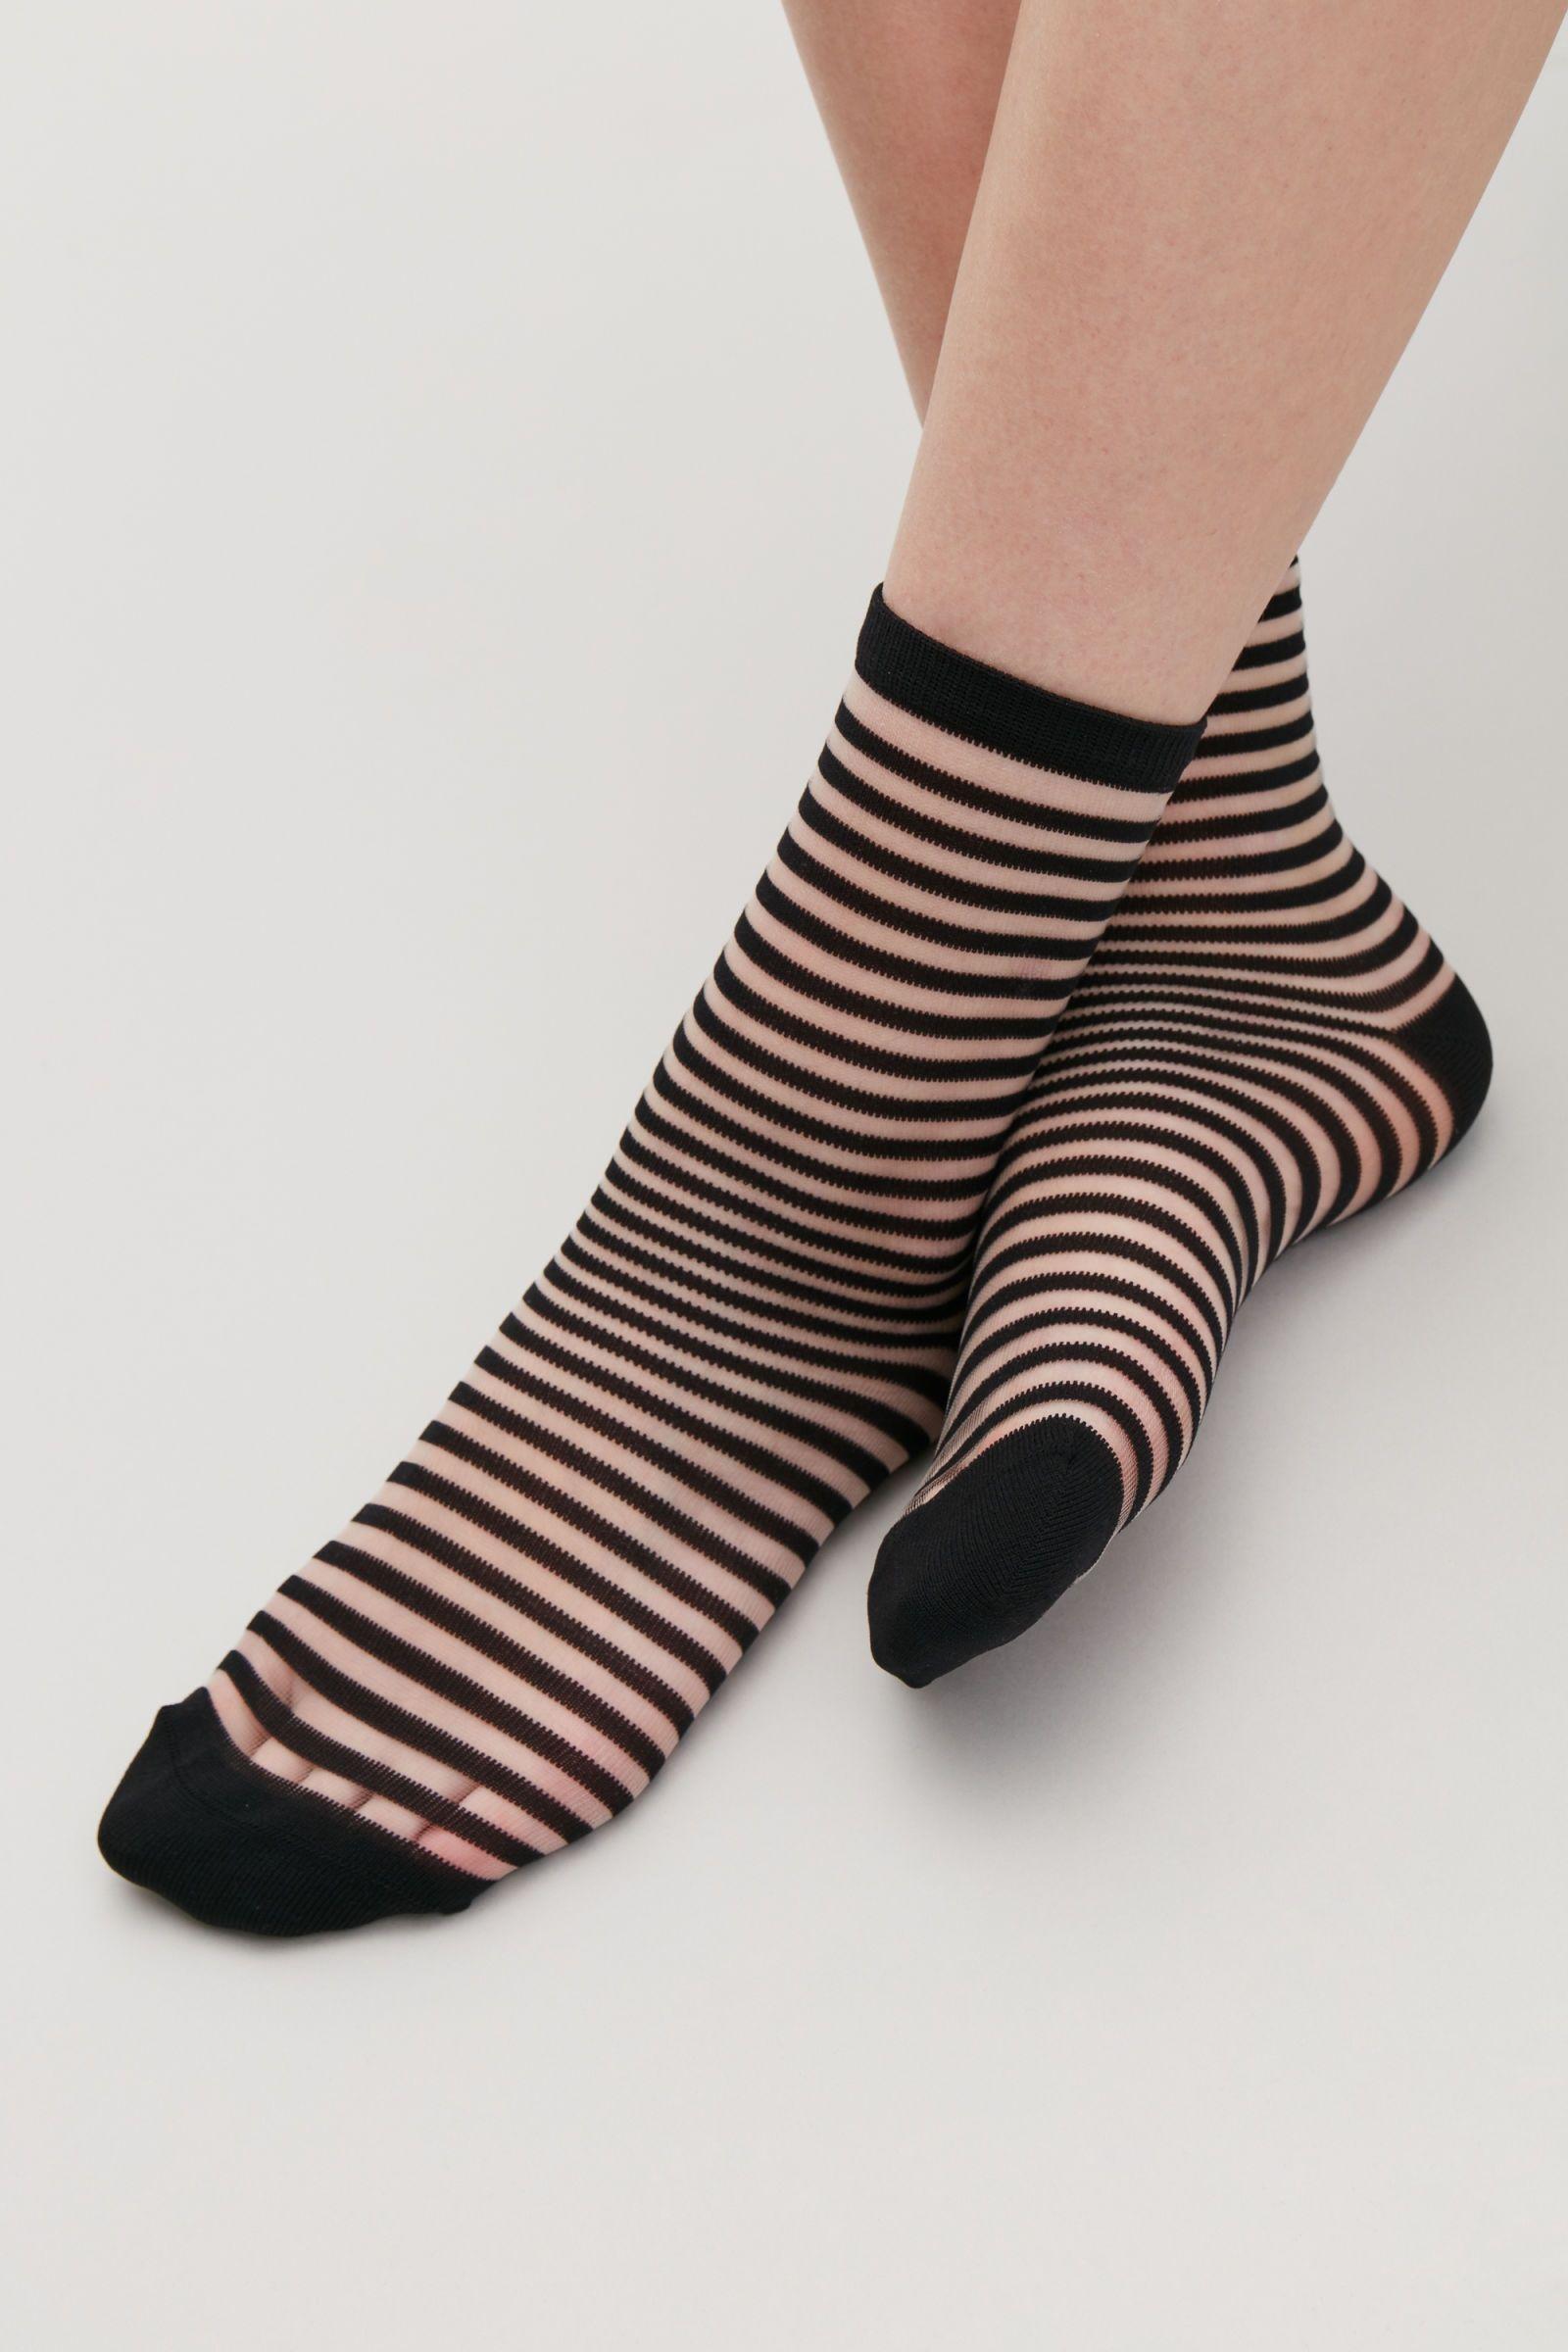 703296ecb2c zoomed image Sock Shoes